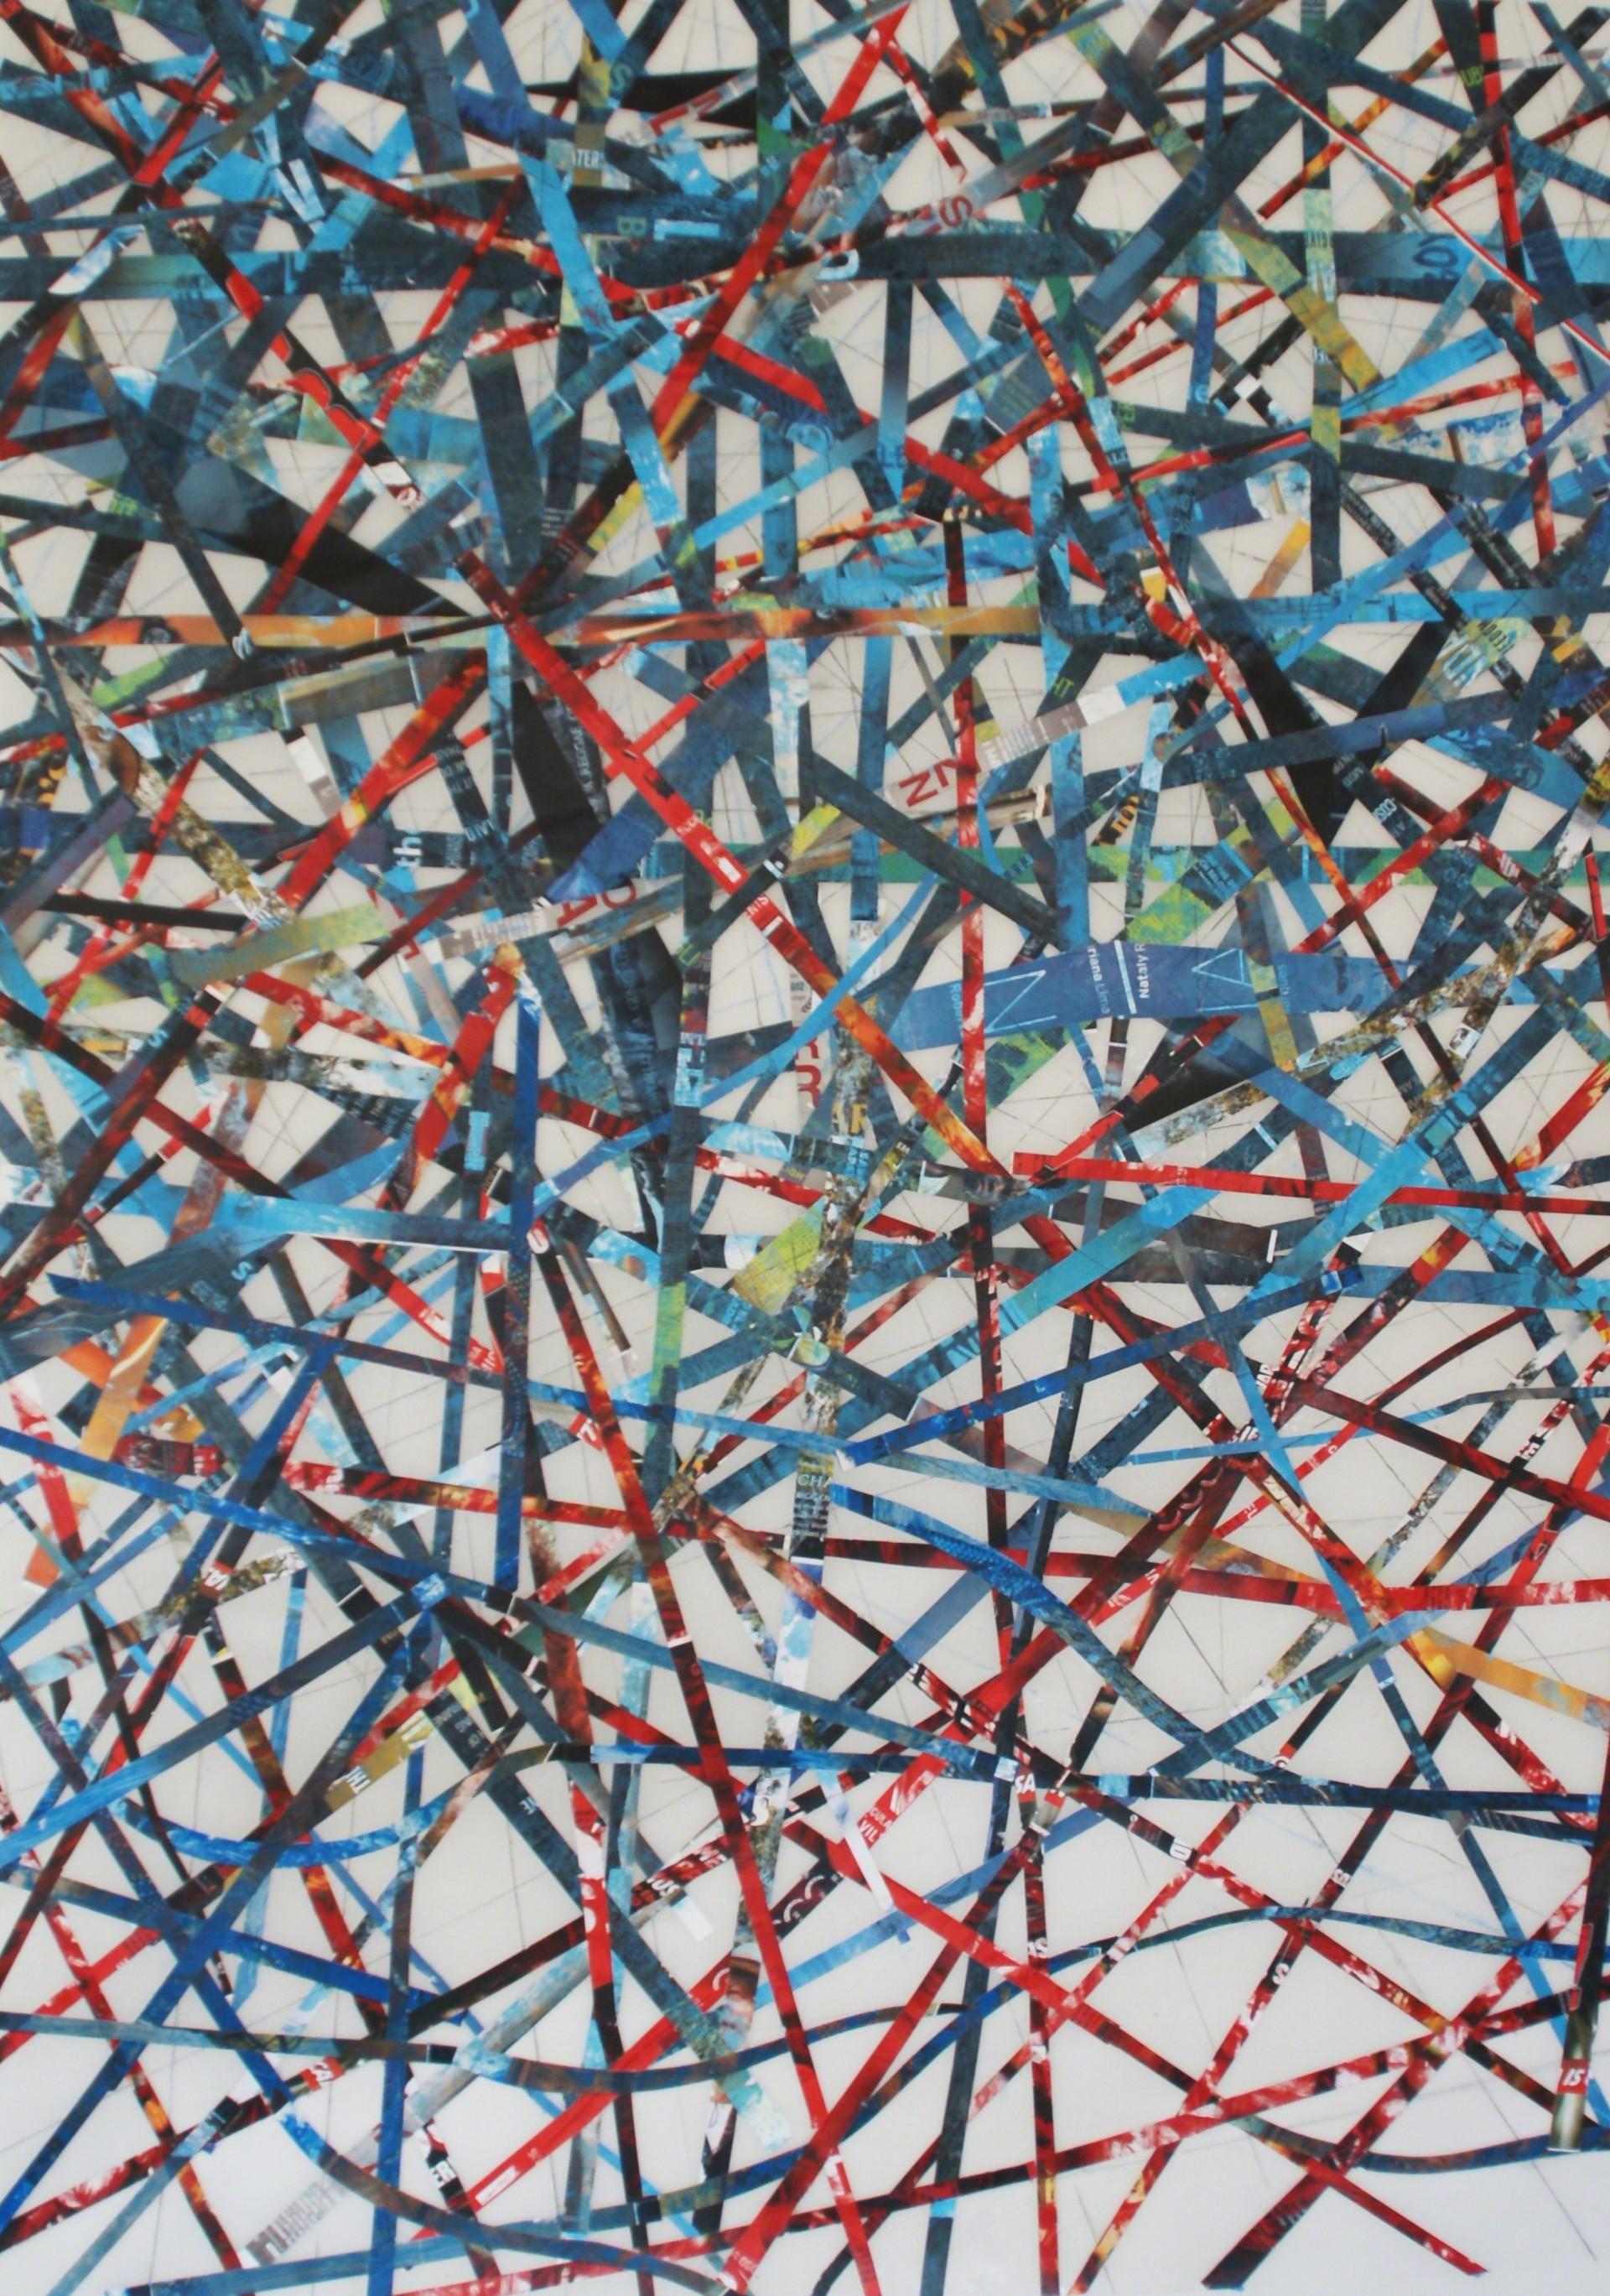 Red, White, Blue and Black by GA Gardner